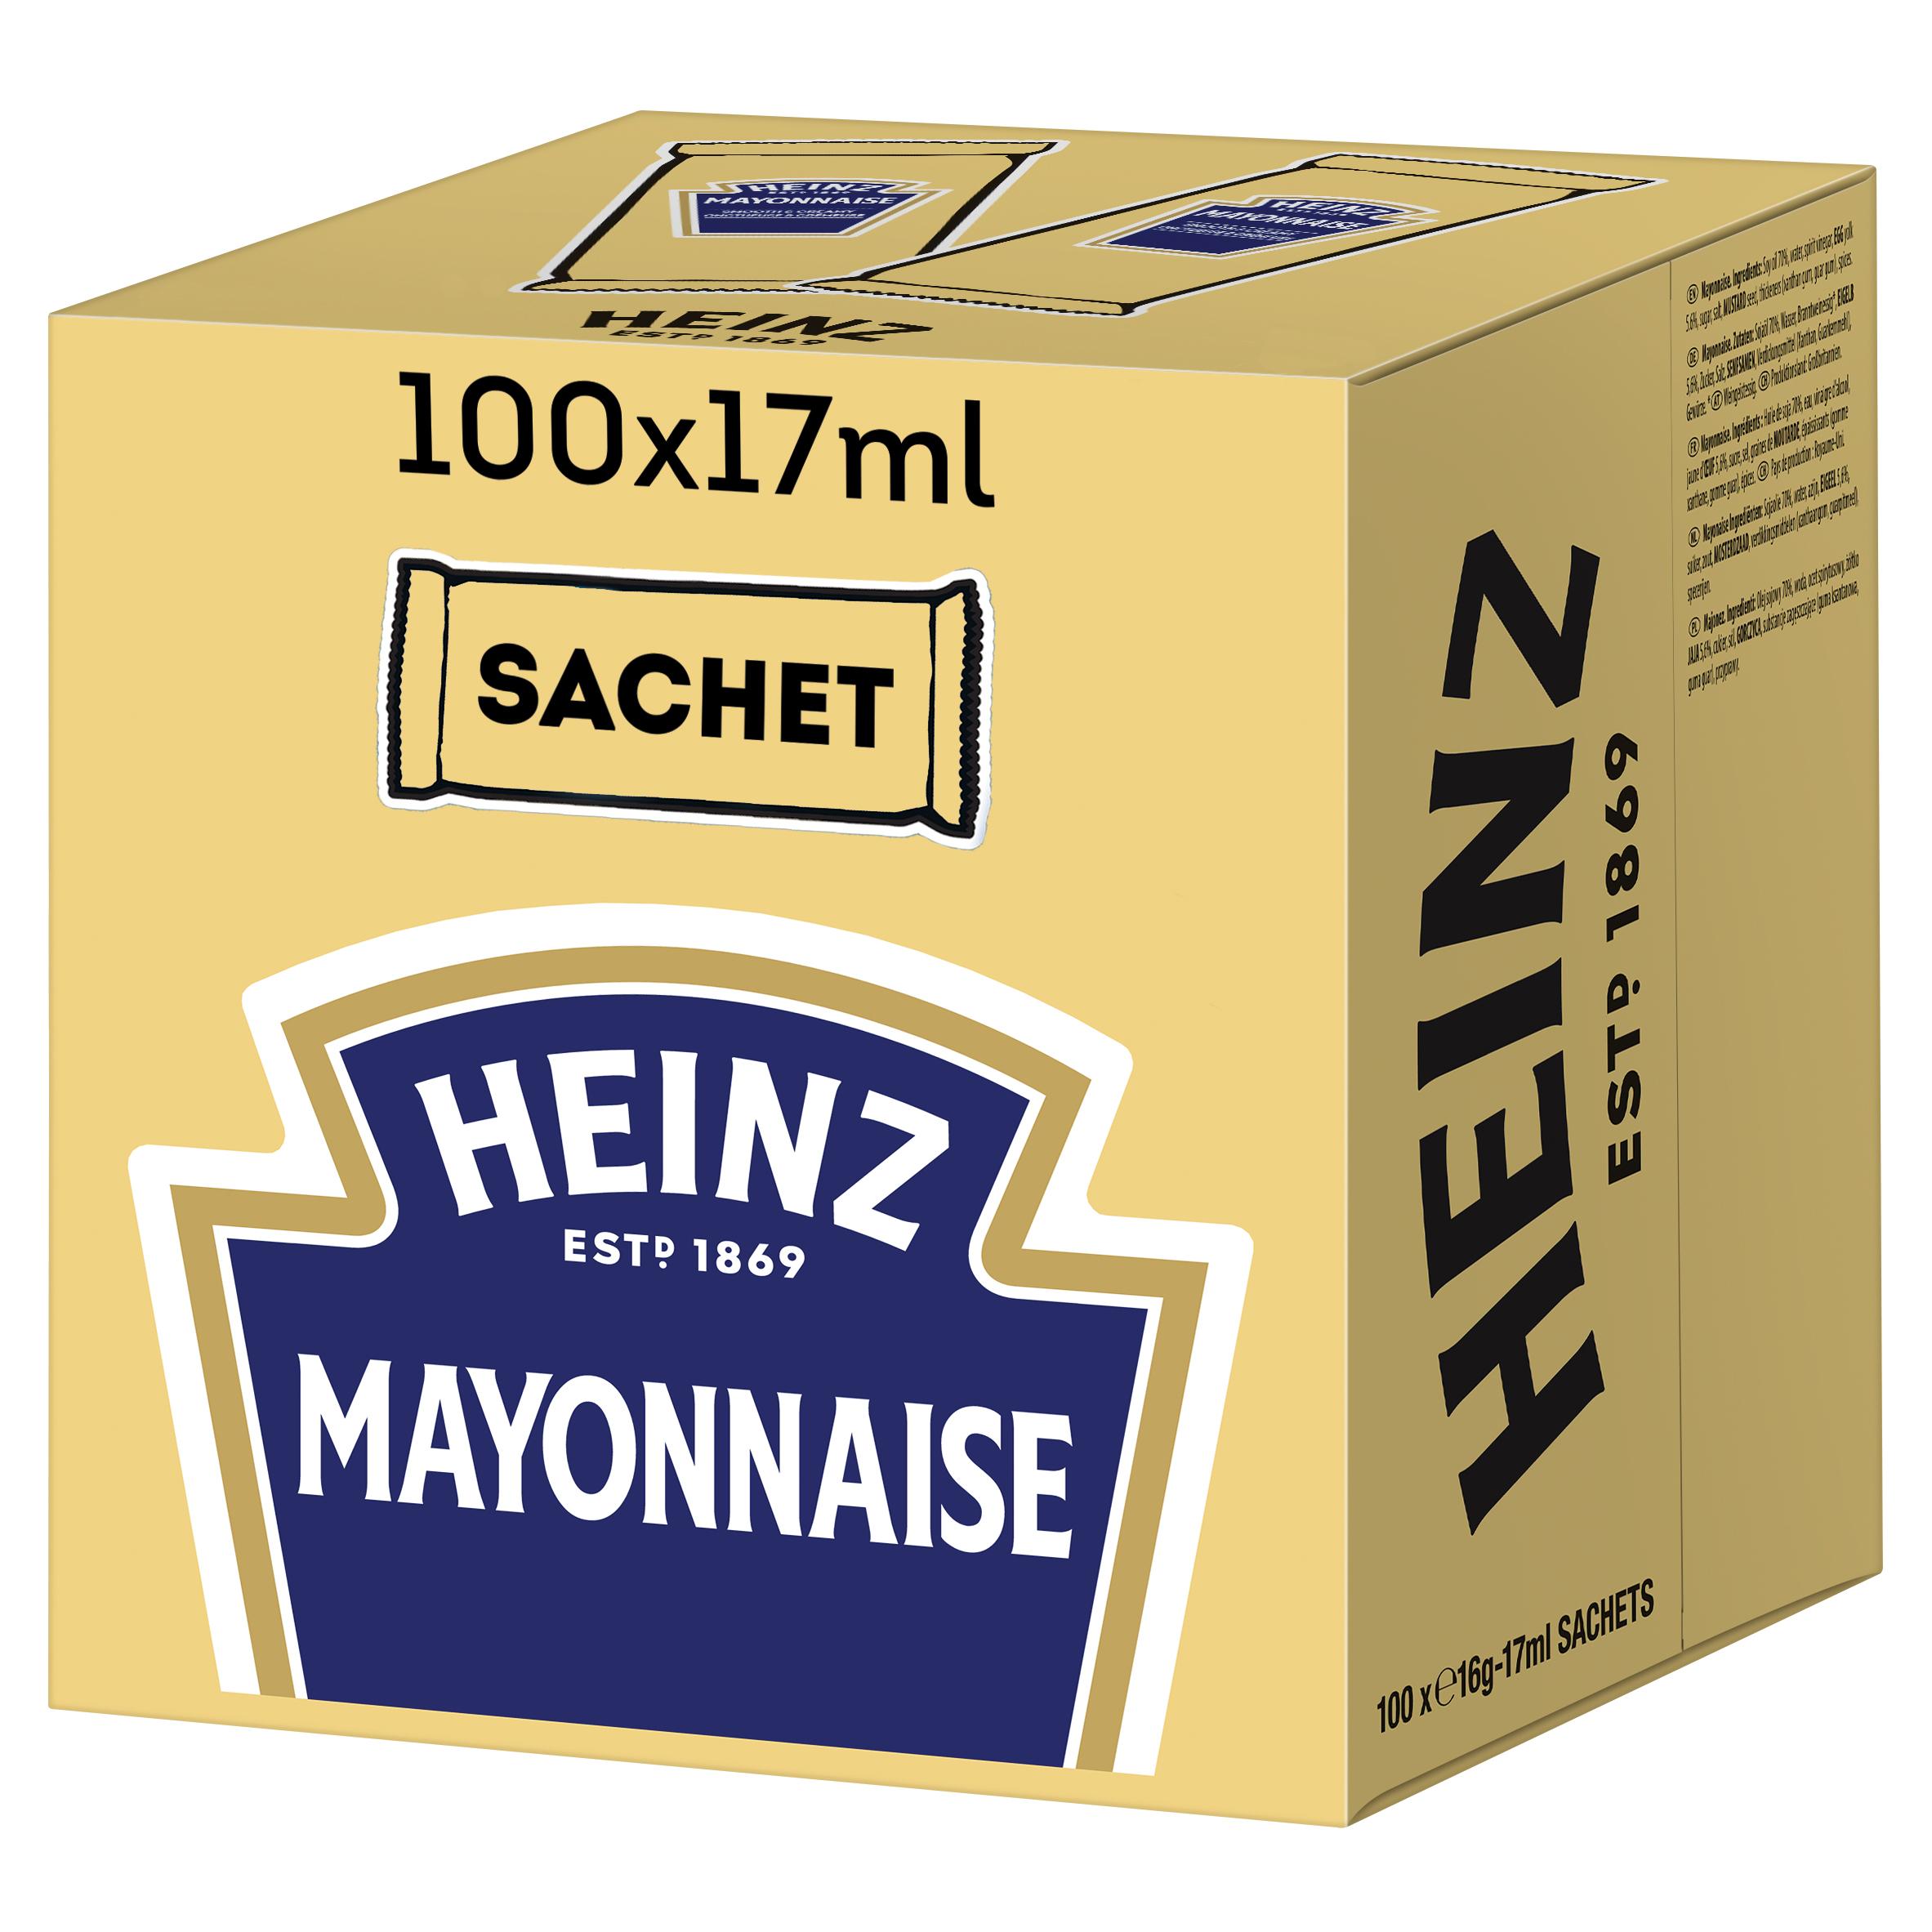 Heinz Mayonaise sachet 17ml